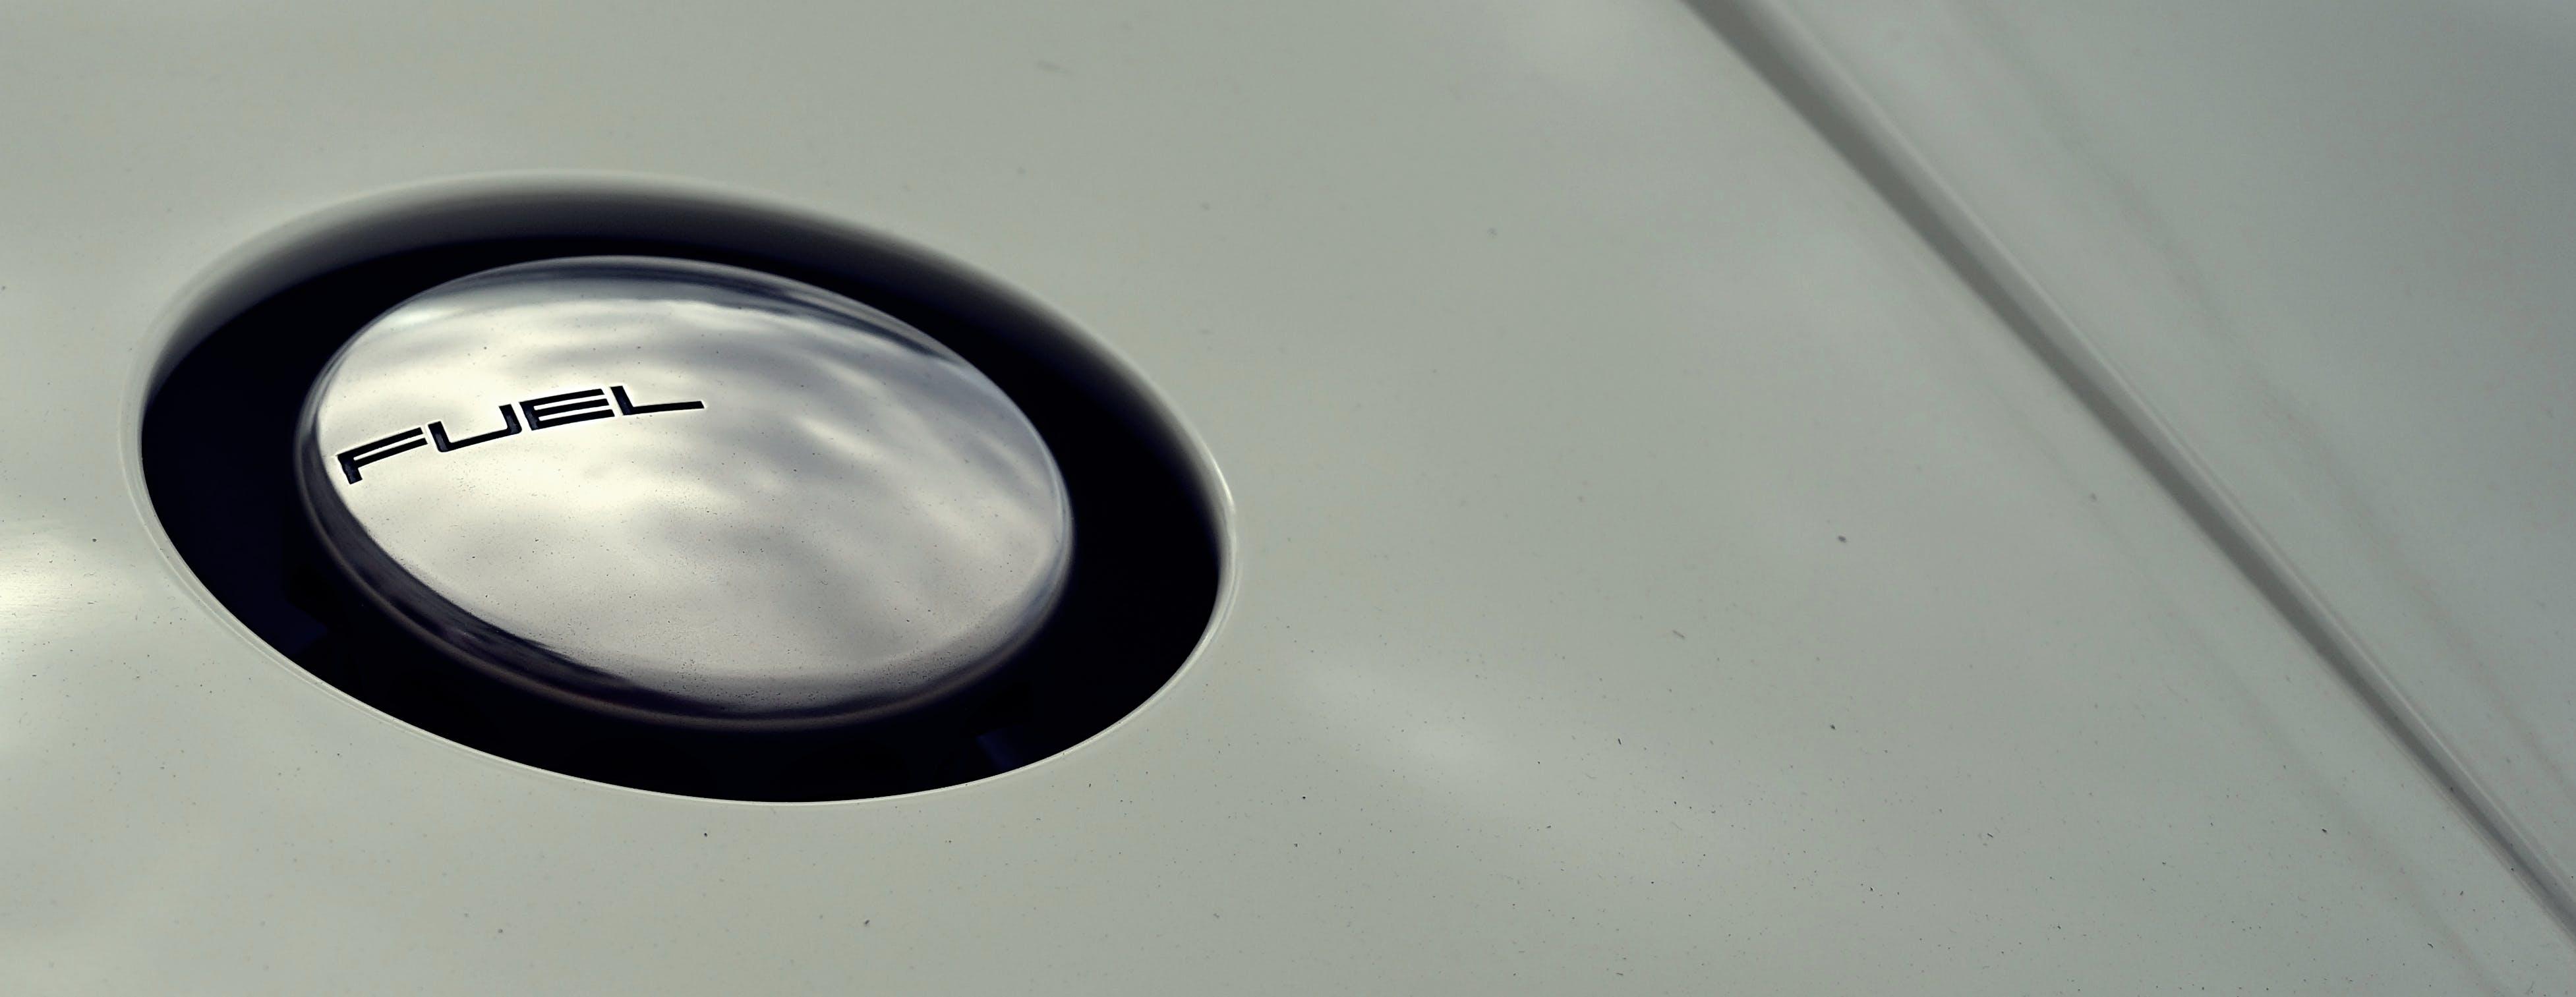 Free stock photo of cars, porsche, singer, singer porsche